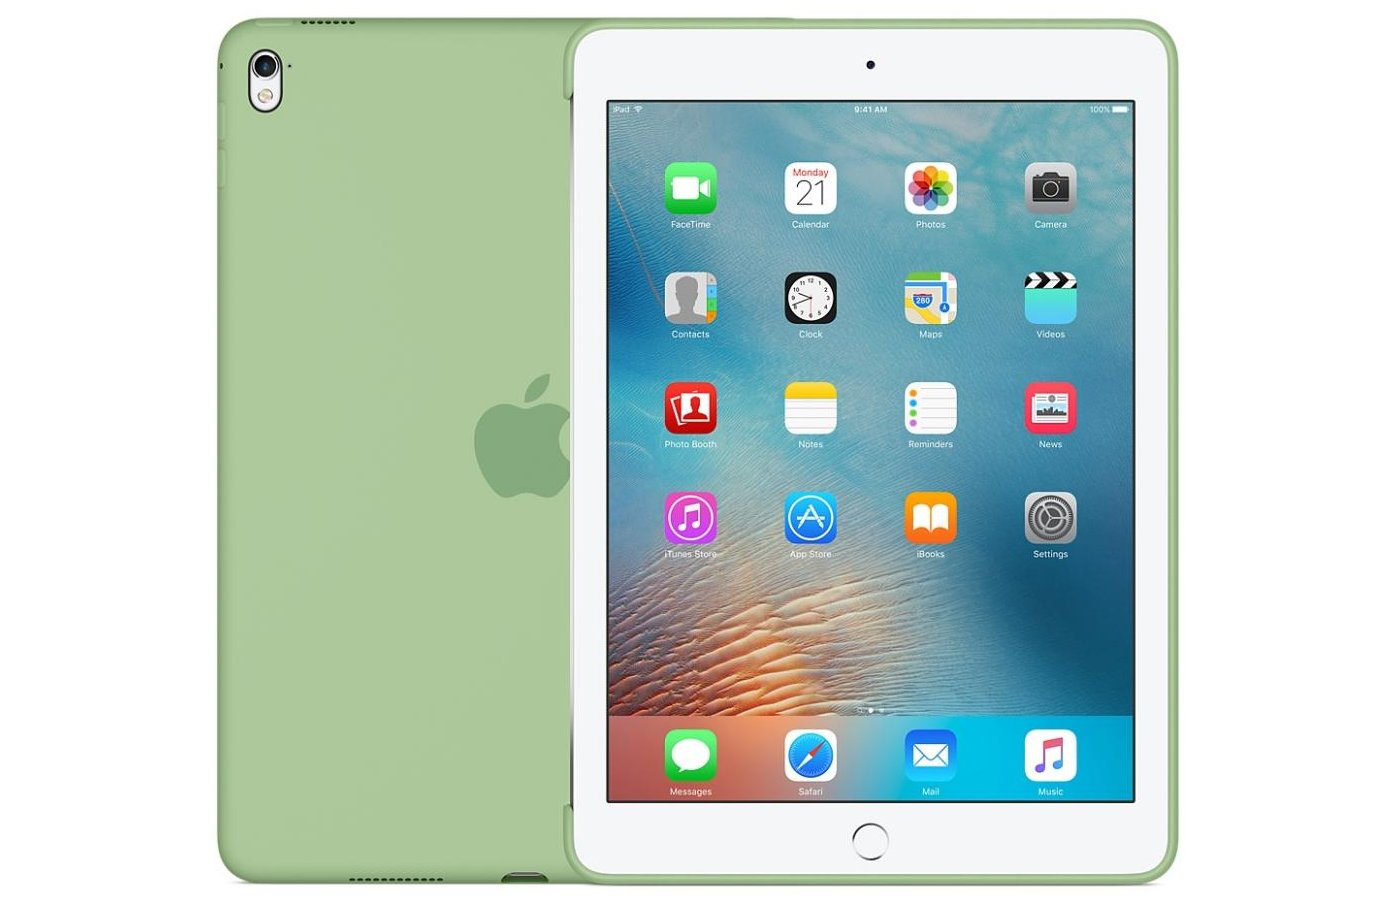 Чехол для планшетного ПК Apple Silicone Case iPad Pro 9.7 - Mint (MMG42ZM/A)